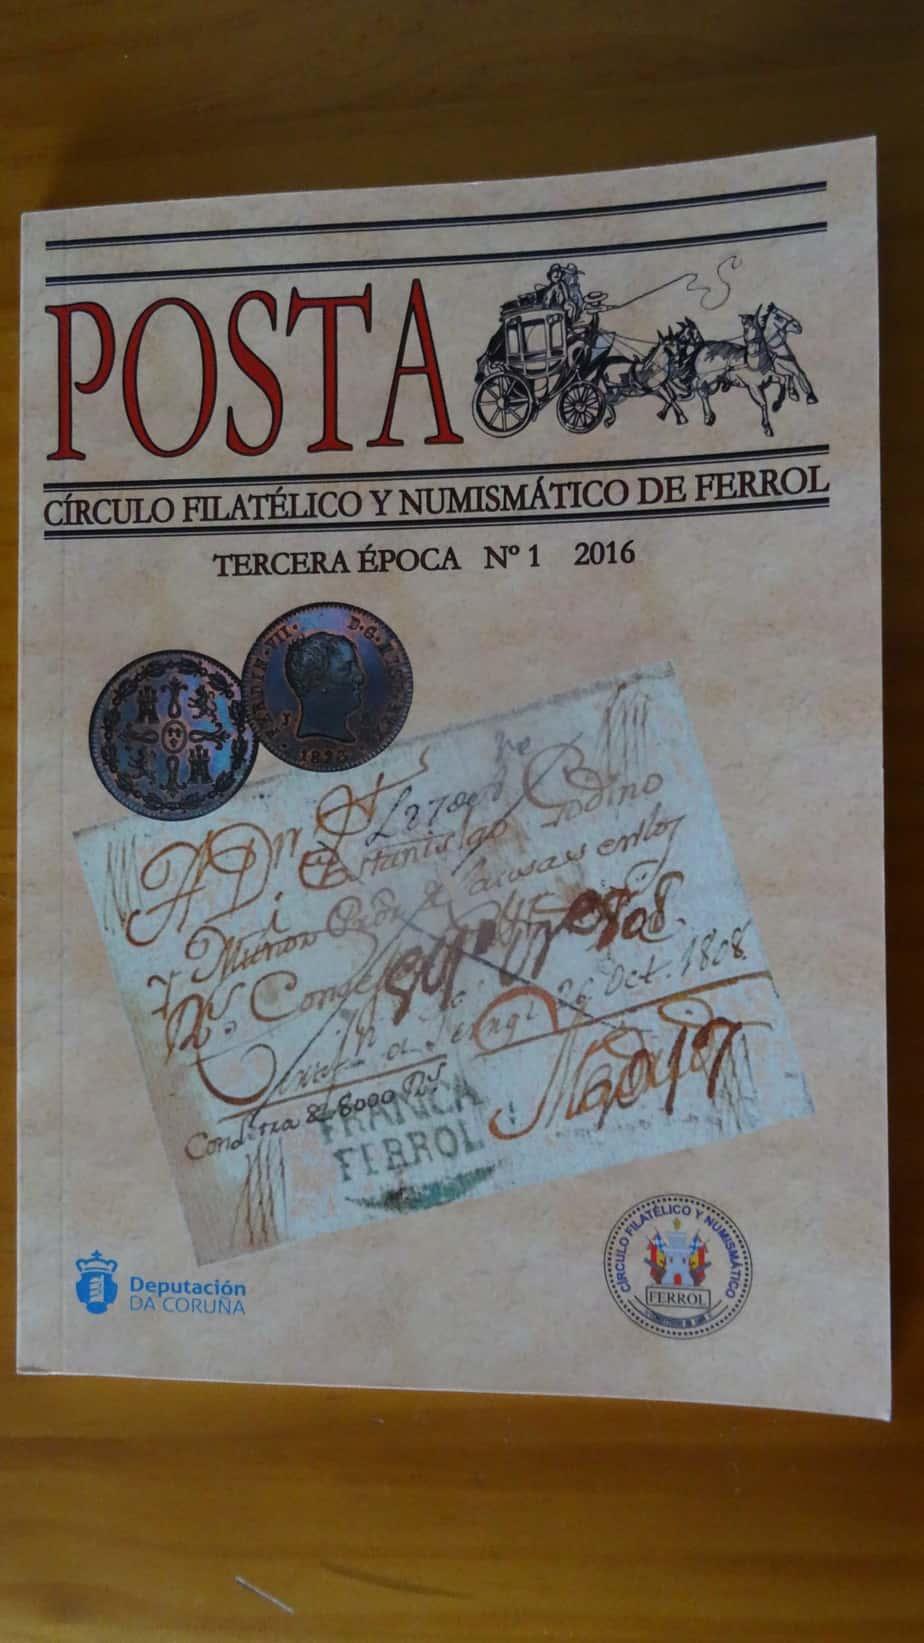 revista Posta